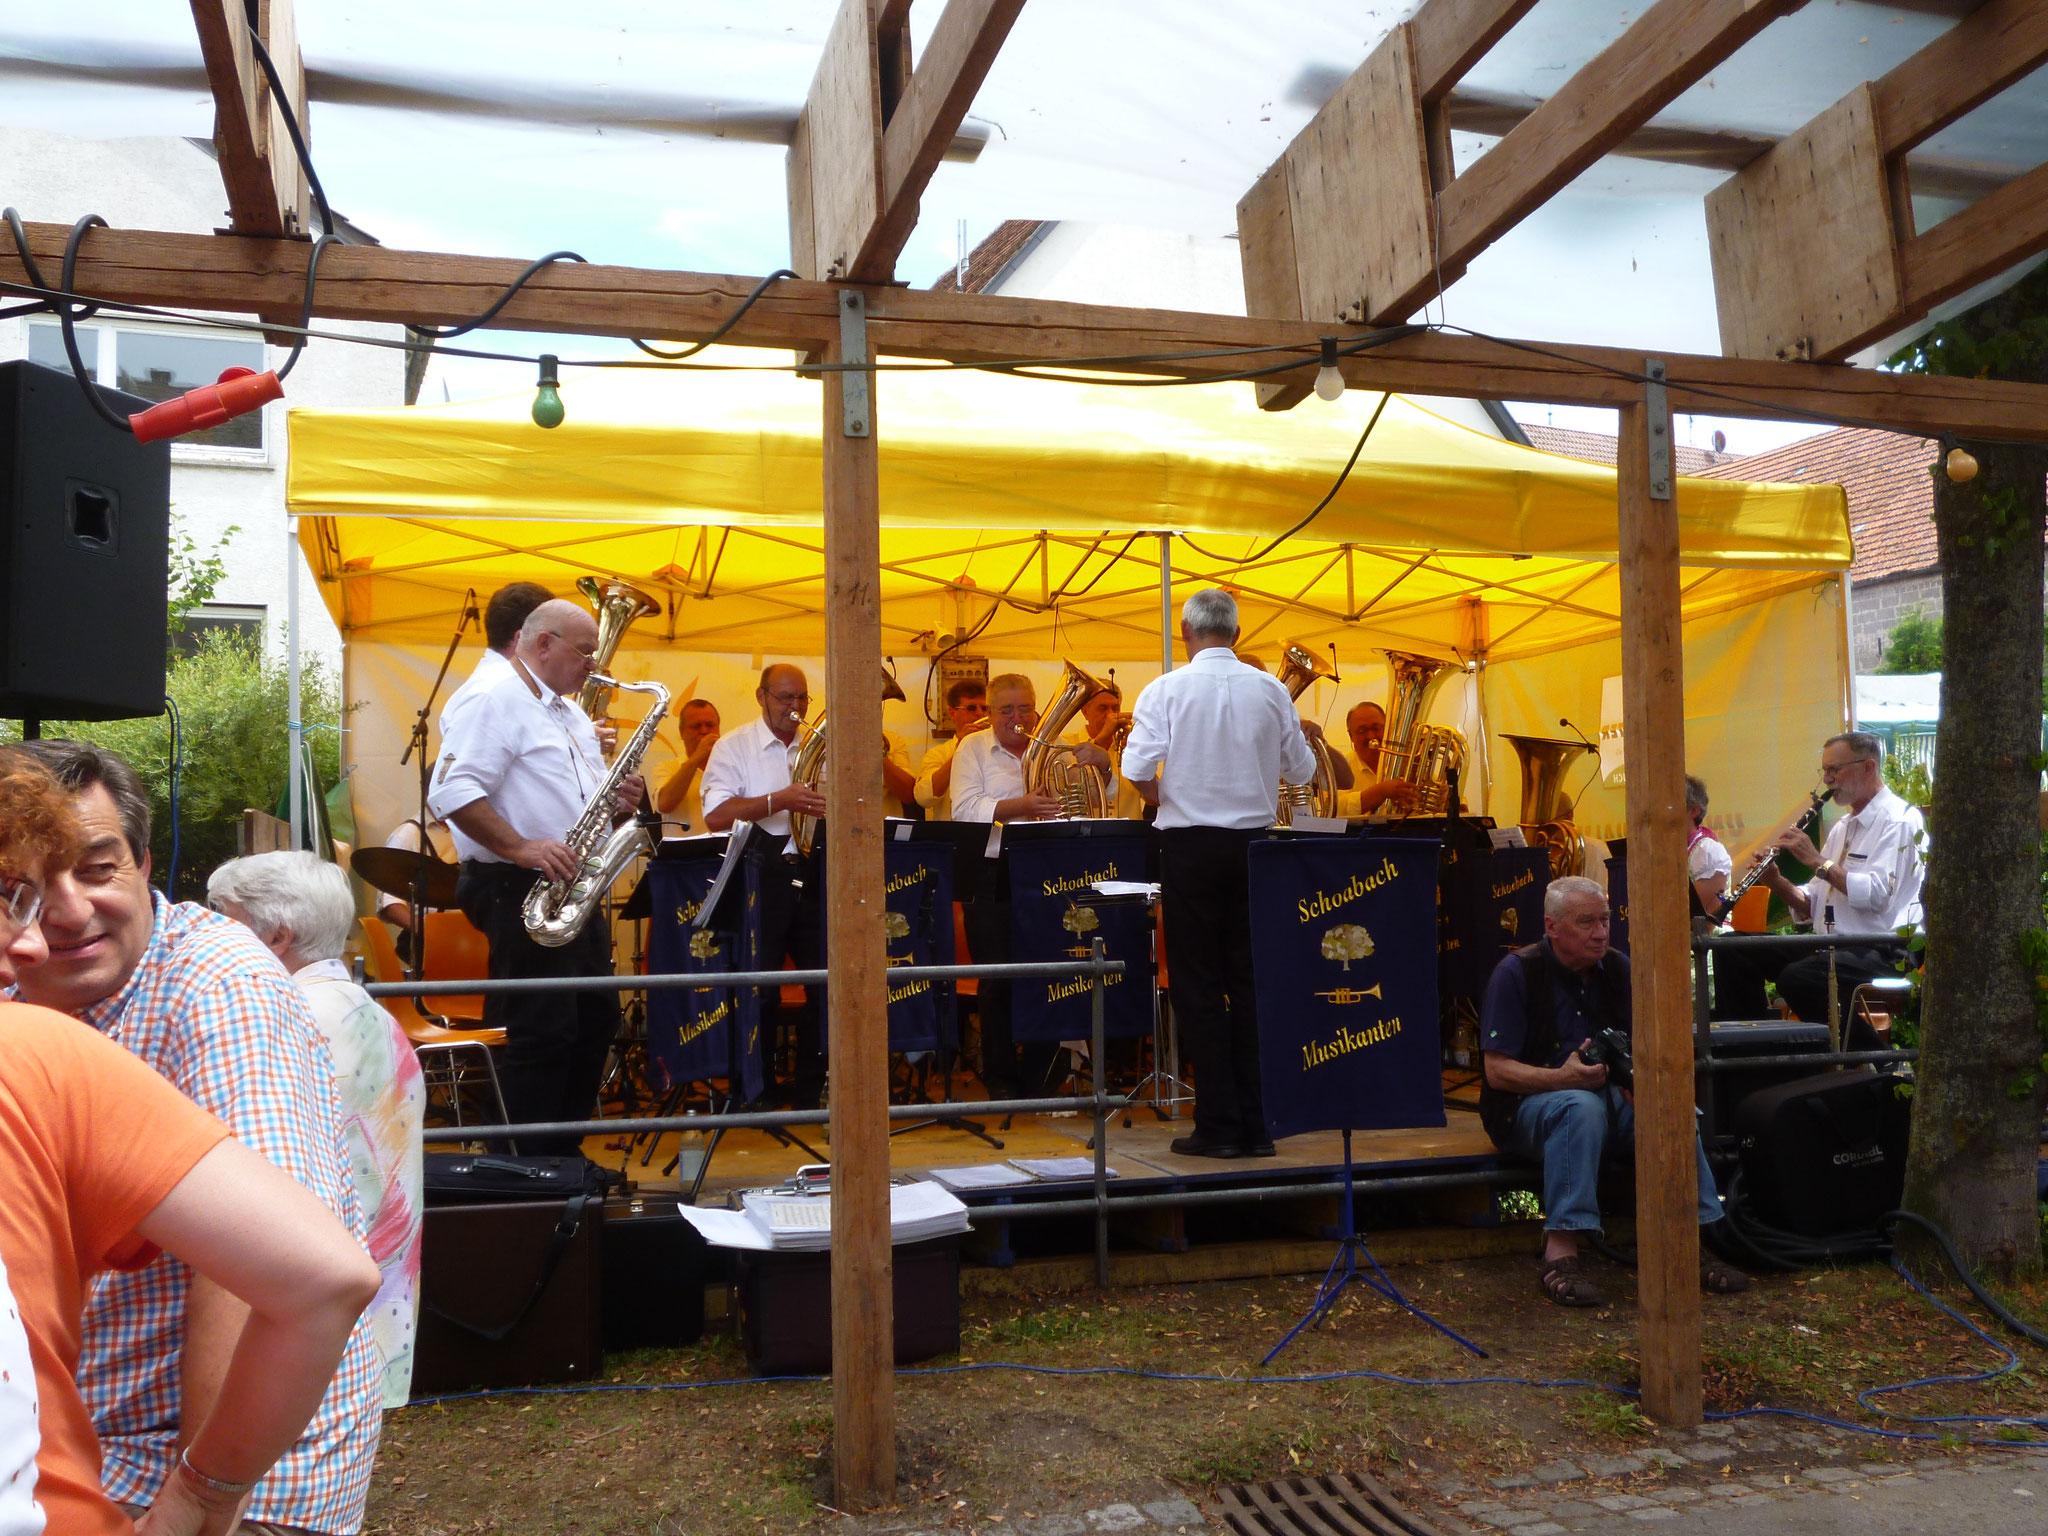 Bachfest TVA 06.07.2014